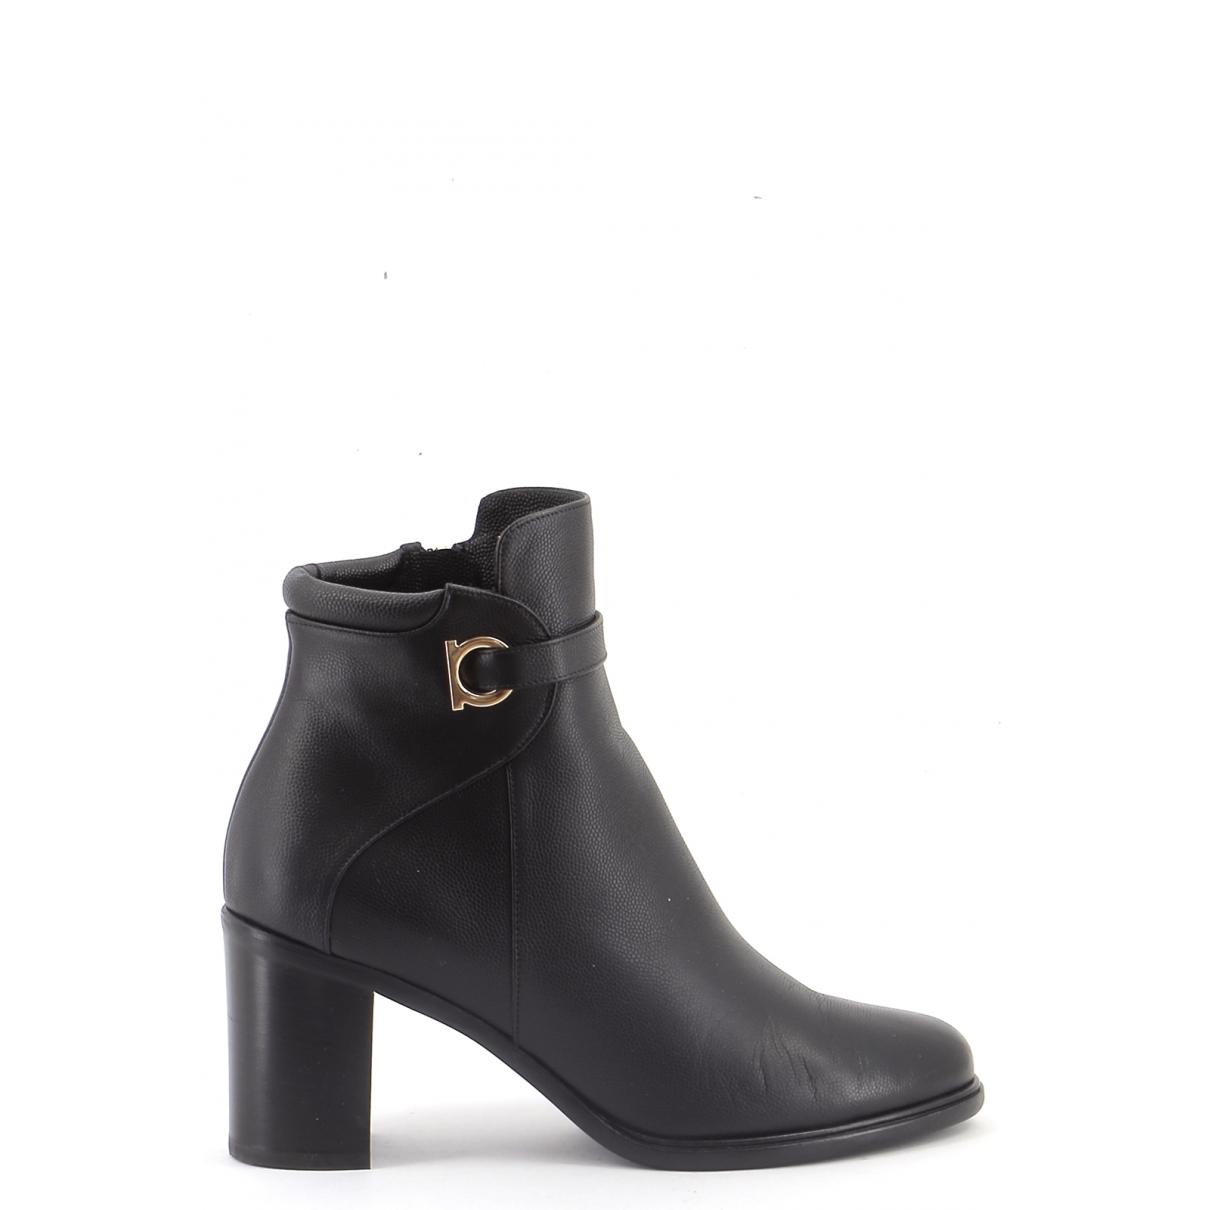 Salvatore Ferragamo \N Black Leather Boots for Women 38 EU